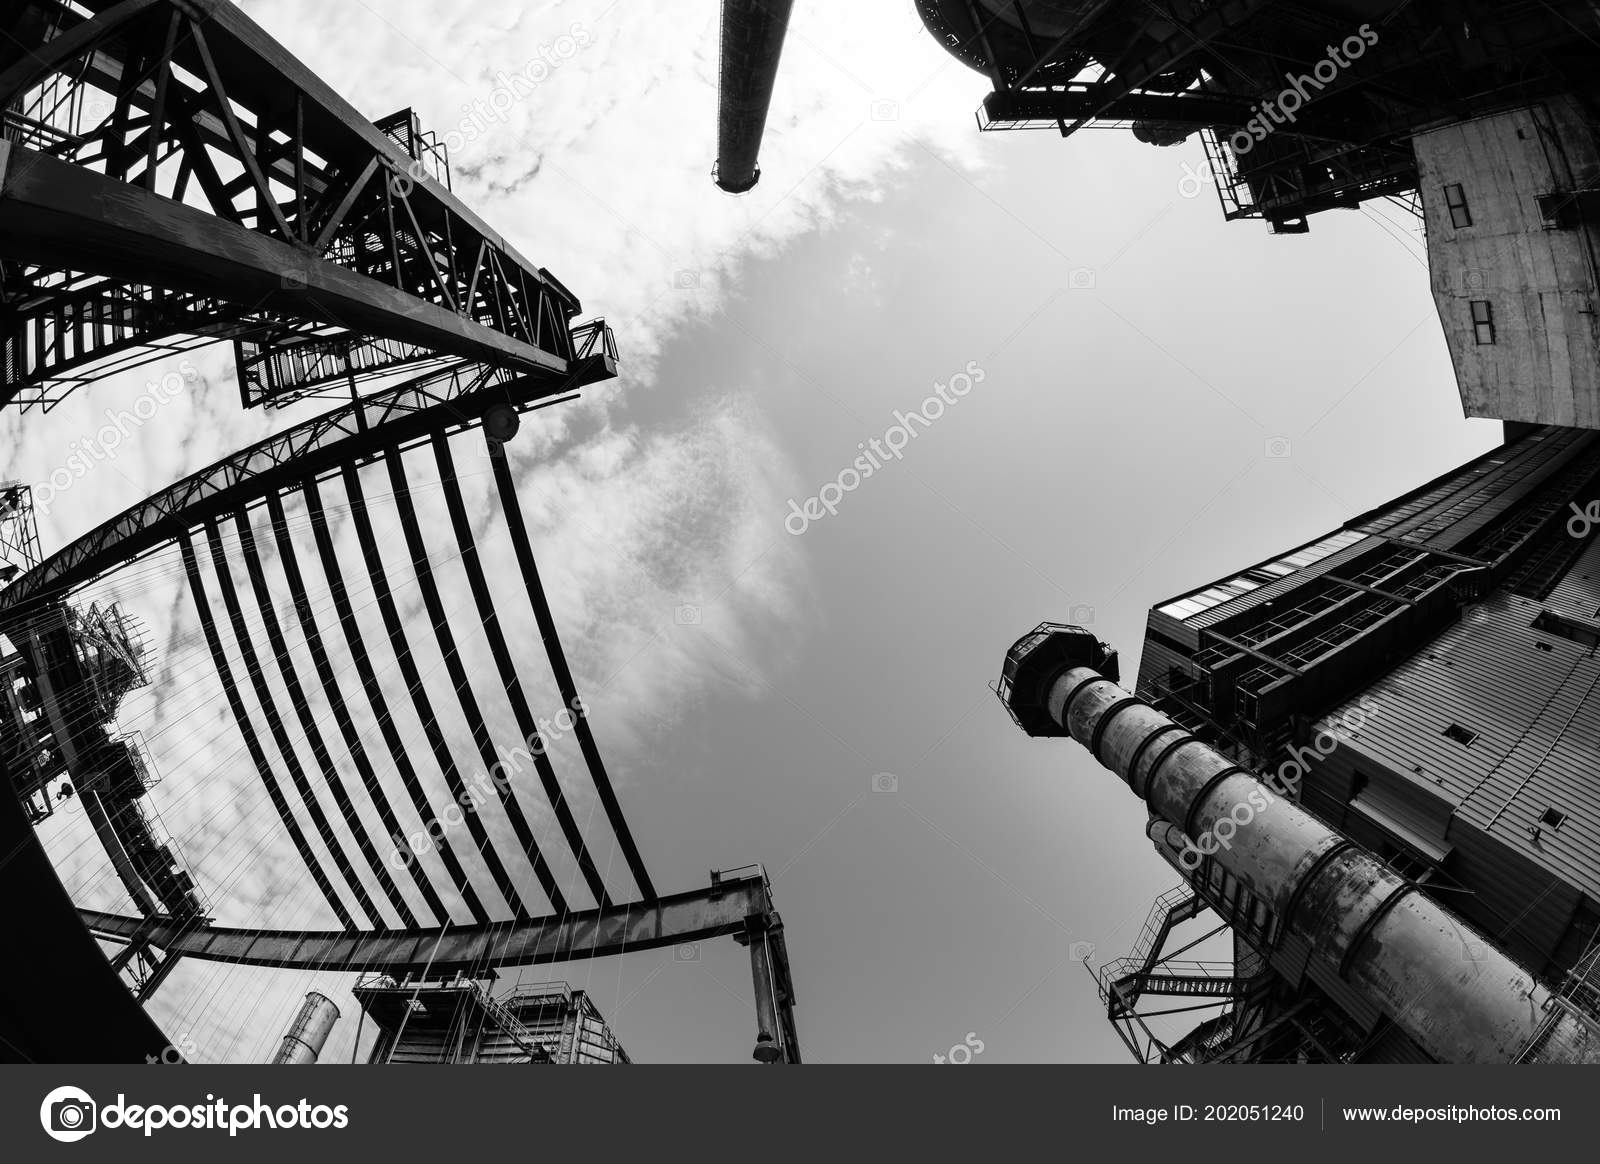 Abandoned Buildings Dolni Vitkovice Industrial Area Ostrava Czech Republic Stock Photo C Vidumg 202051240